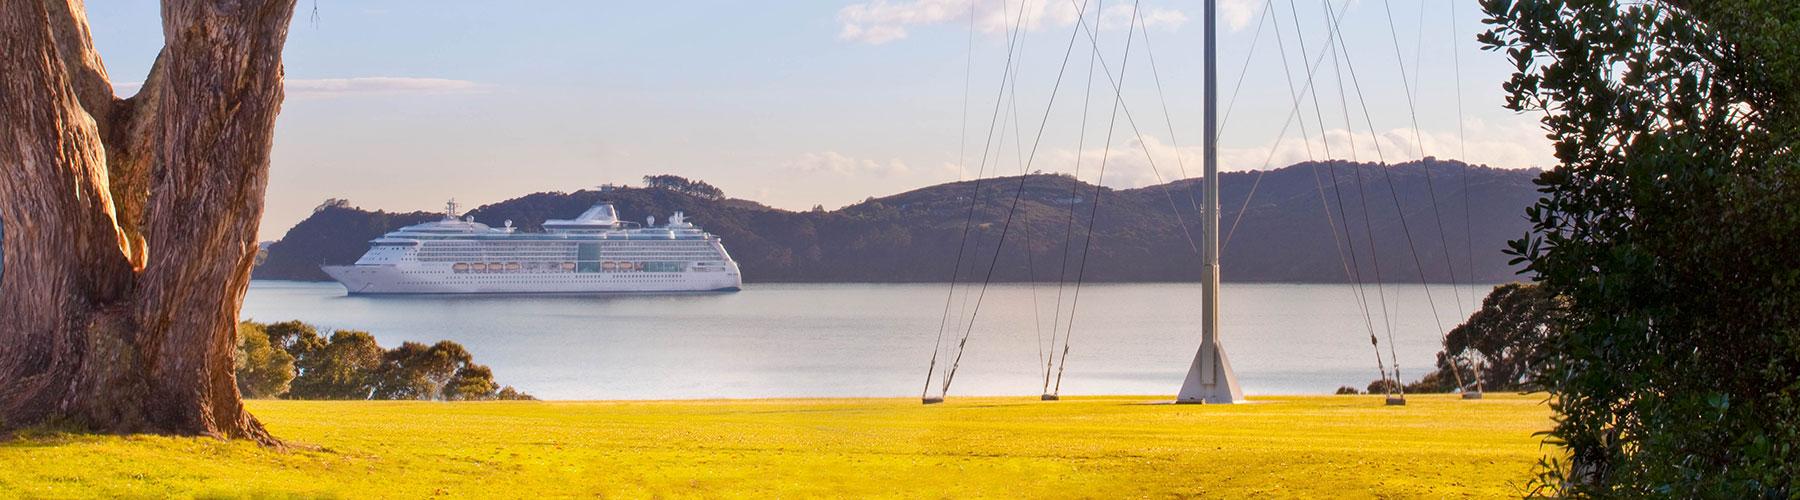 Cruise Ships - Bay of Islands